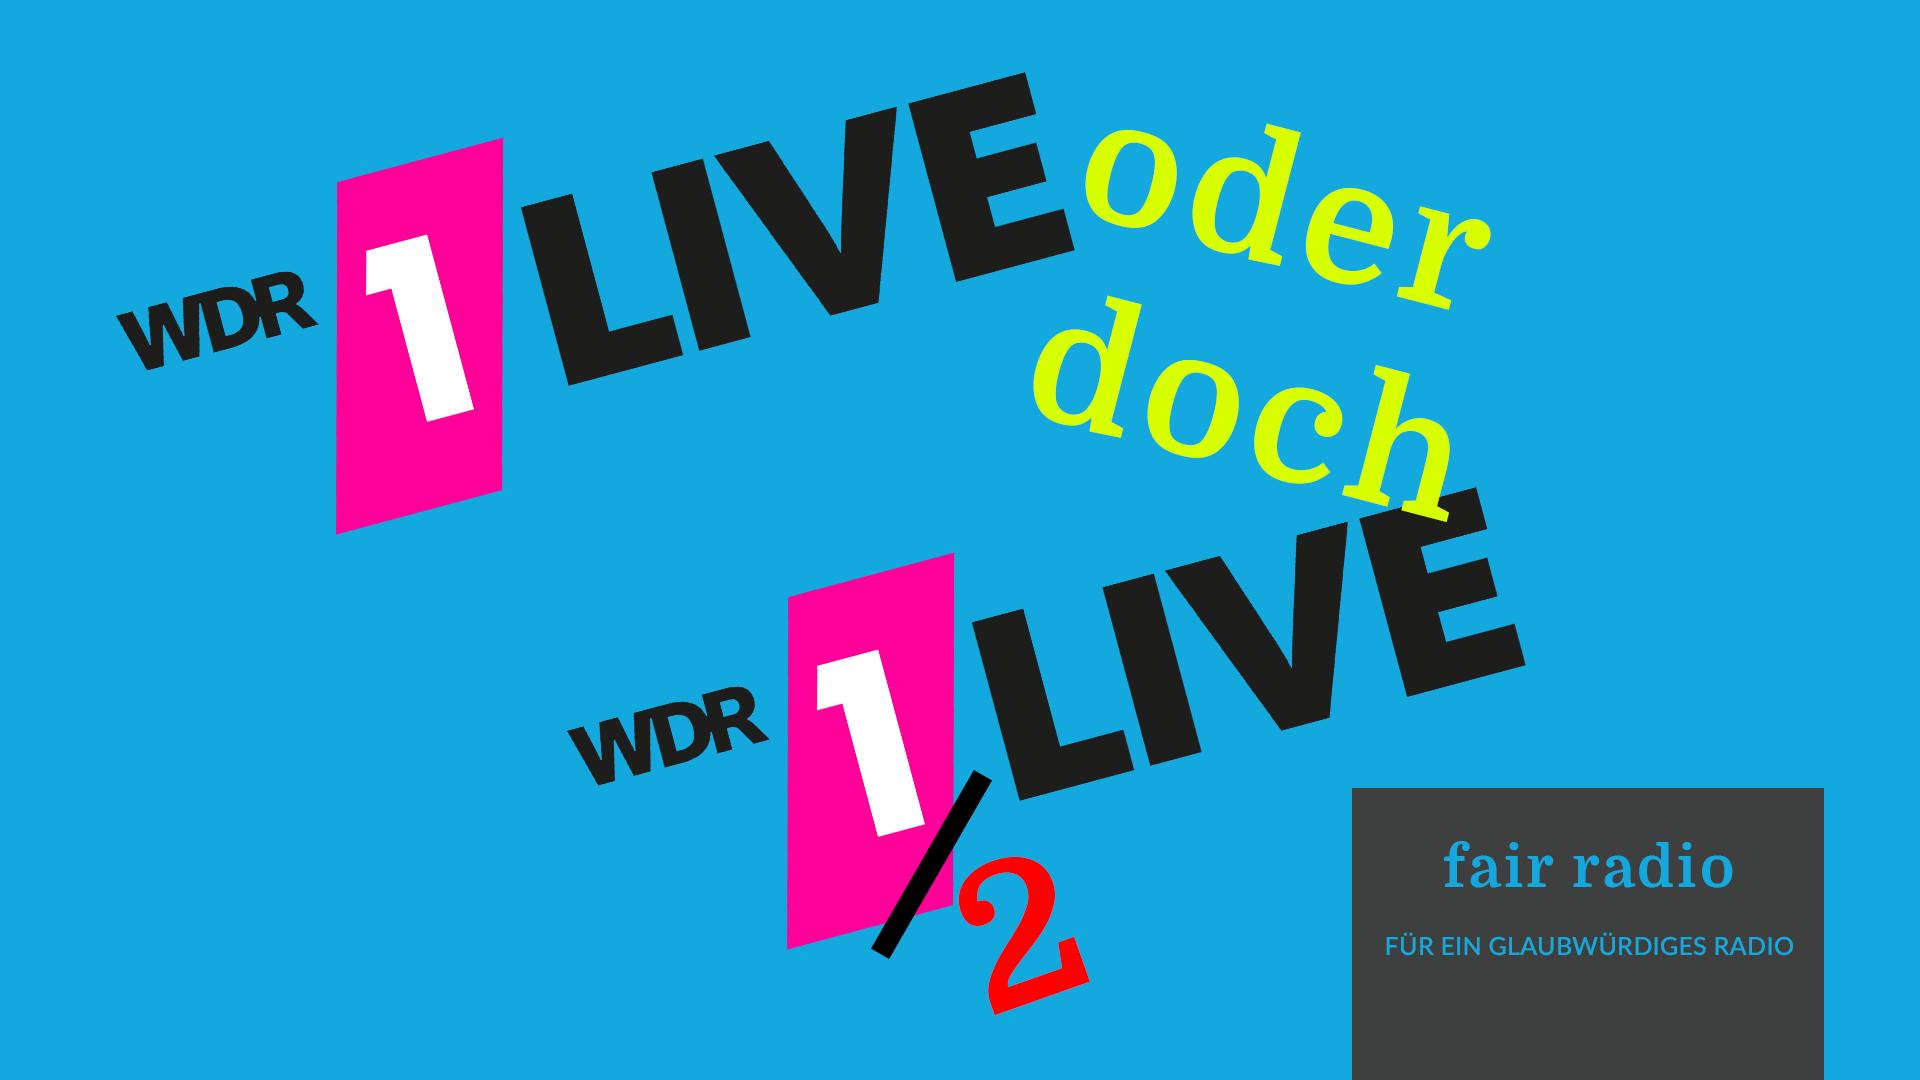 Nicht Live Halb Live 1live Fair Radio